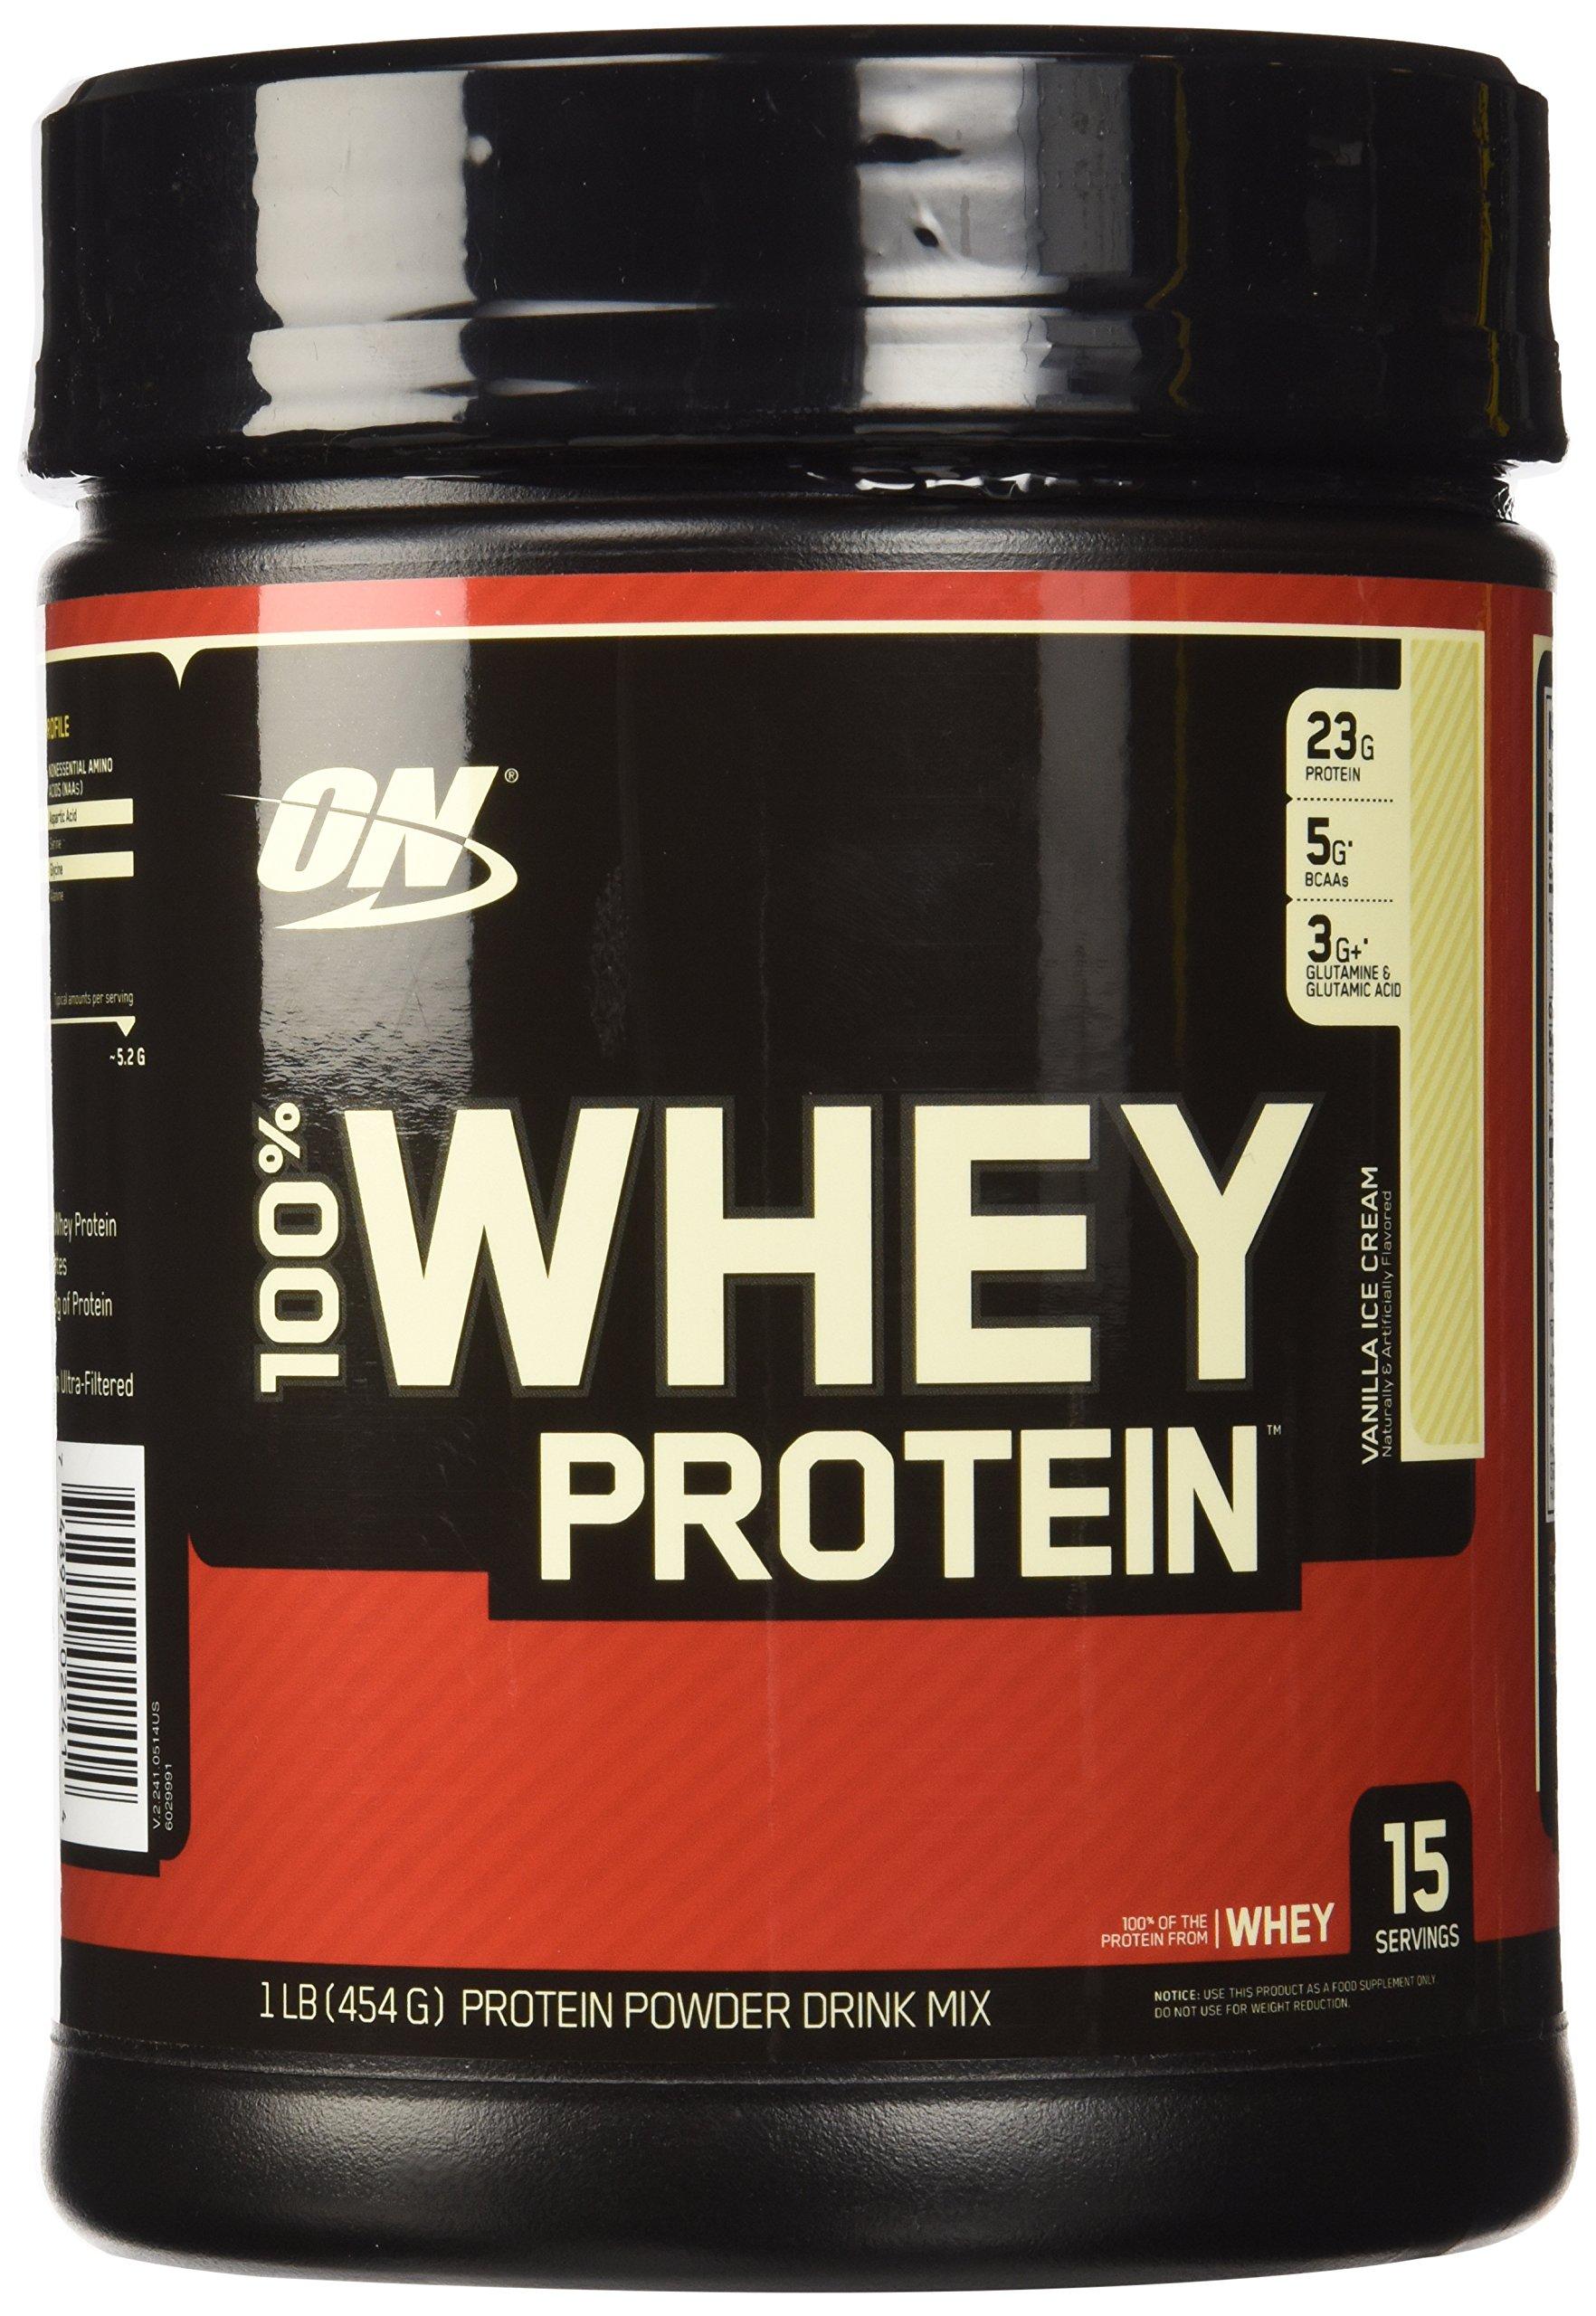 OPTIMUM NUTRITION 100% Whey Protein, Vanilla Ice Cream, 16 Ounce by Optimum Nutrition